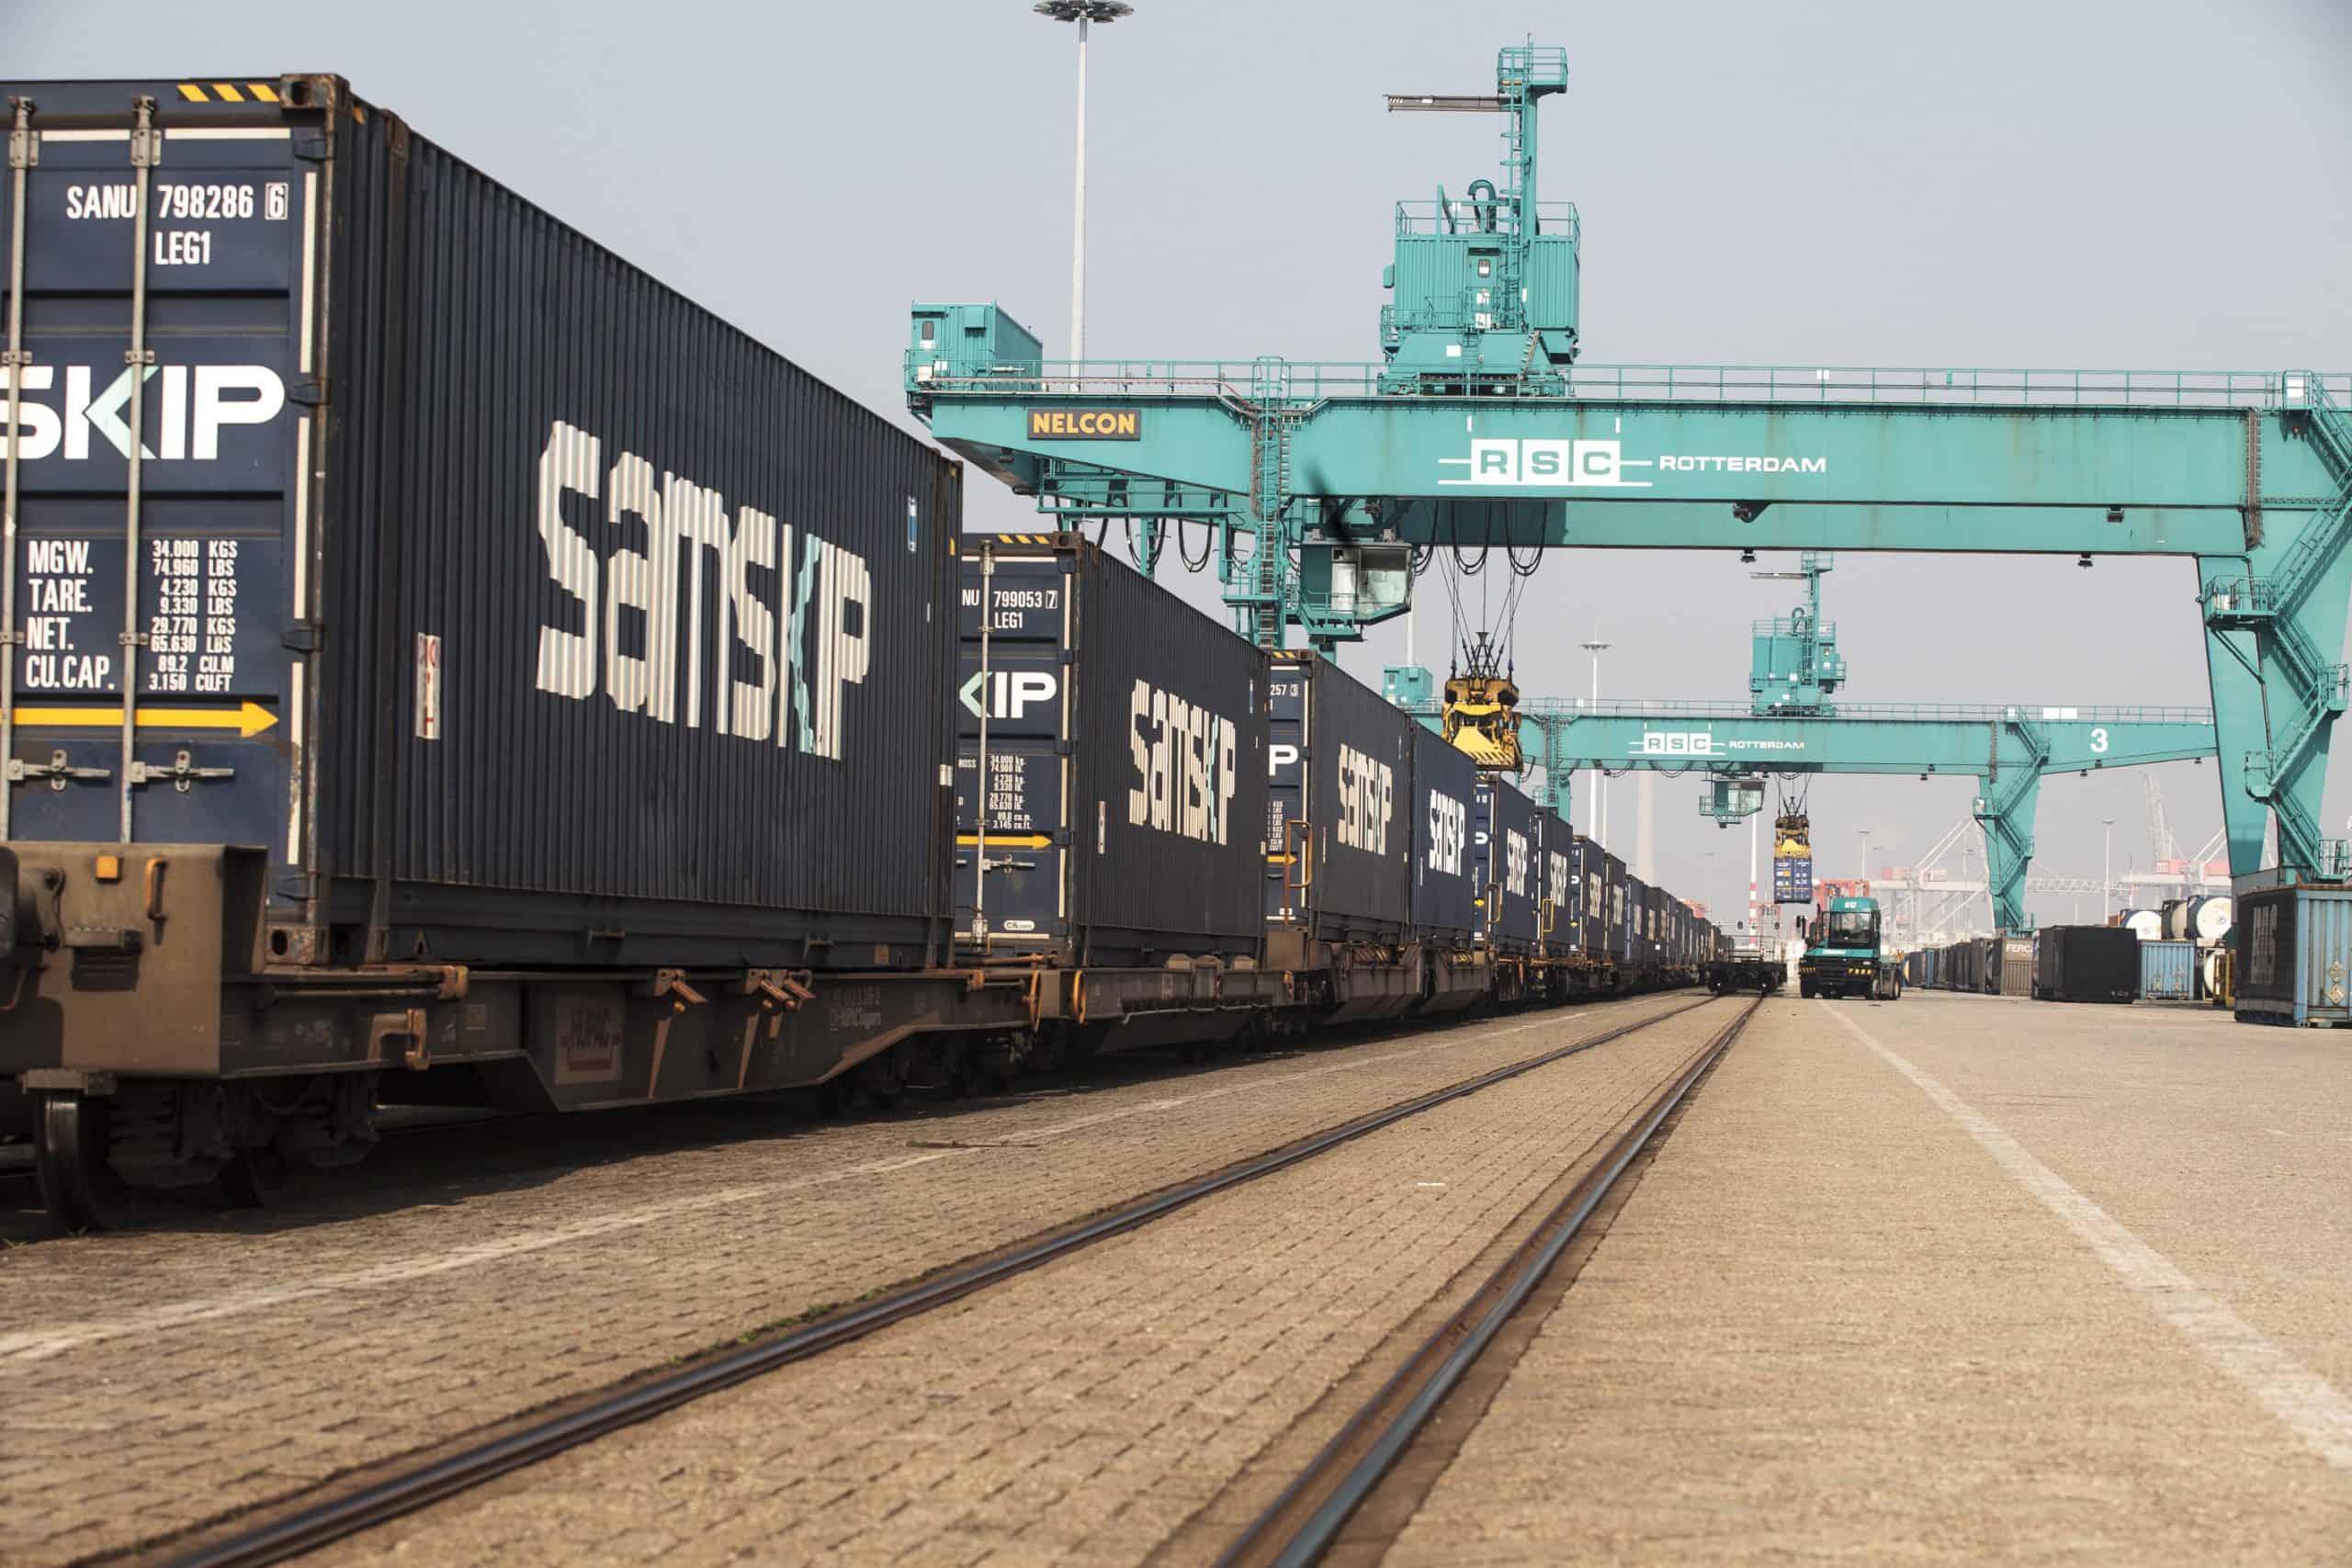 Samskip launches dedicated intermodal rail service between Rotterdam and Italy